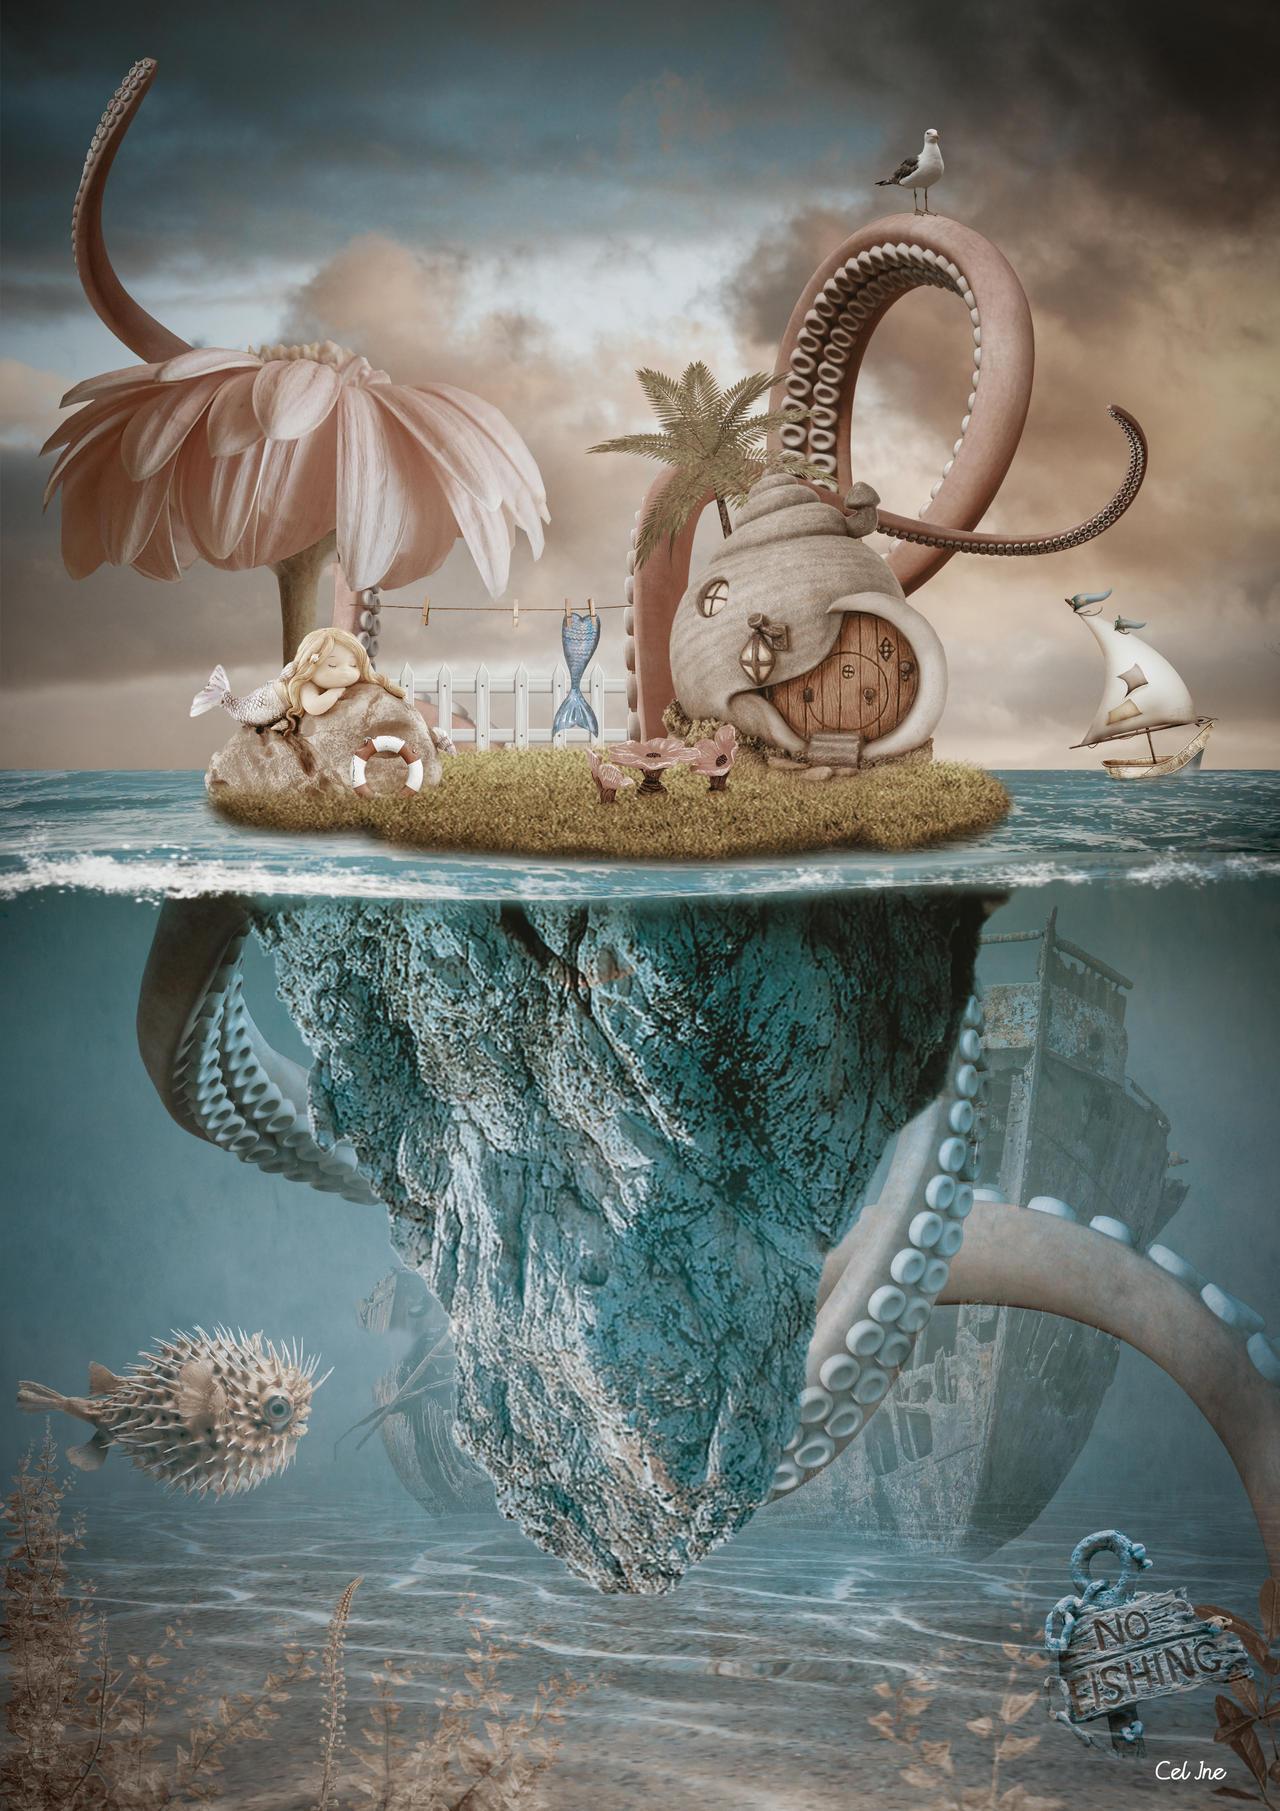 The island of mermaid